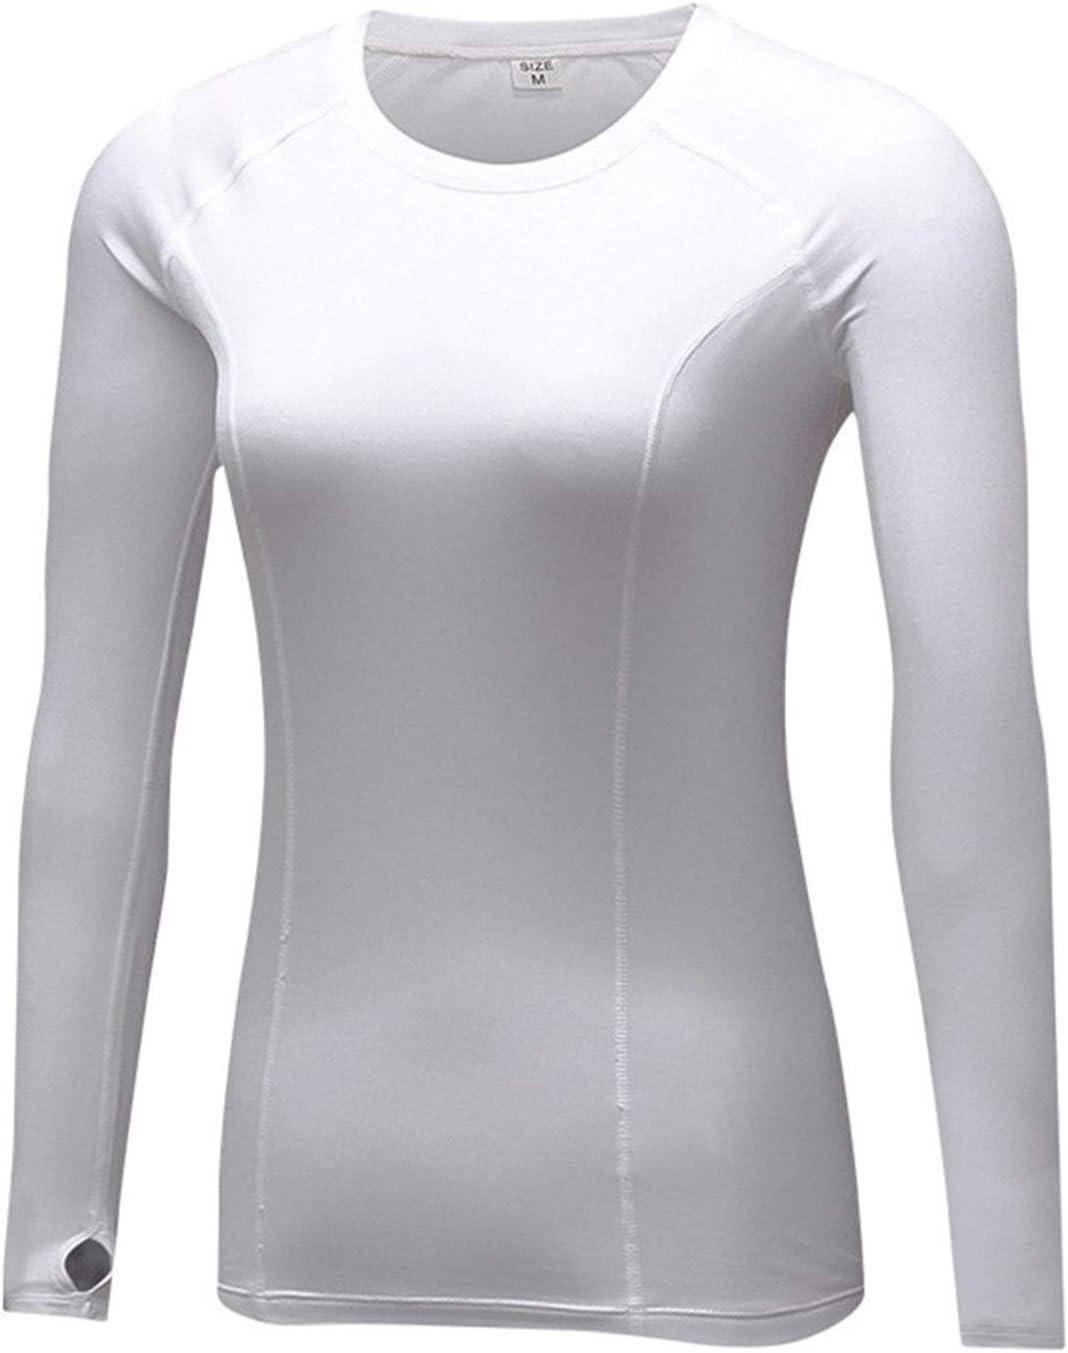 QWERBAM Autumn Winter Warm Clothes Women Quick Dry Stretch Warm Thermal Underwear Women (Color : White, Size : Medium)